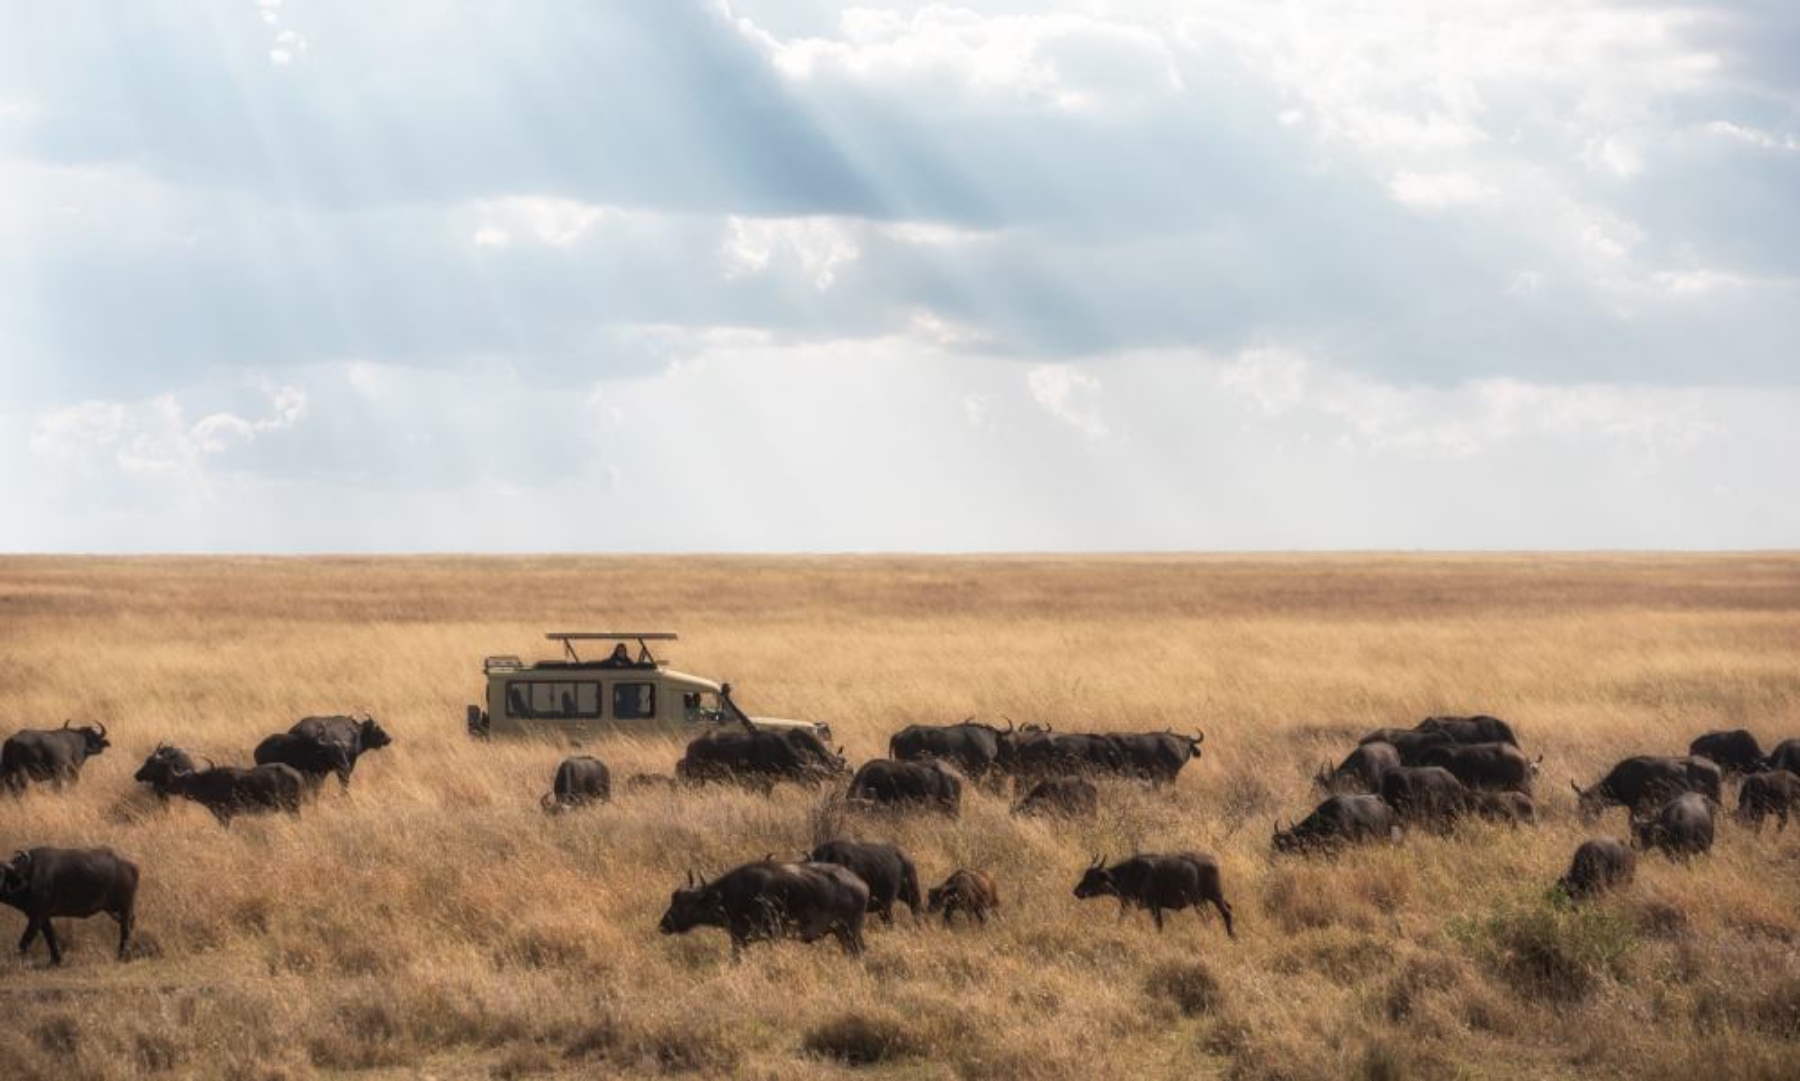 wildlife ngorongoro crater tanzania safari